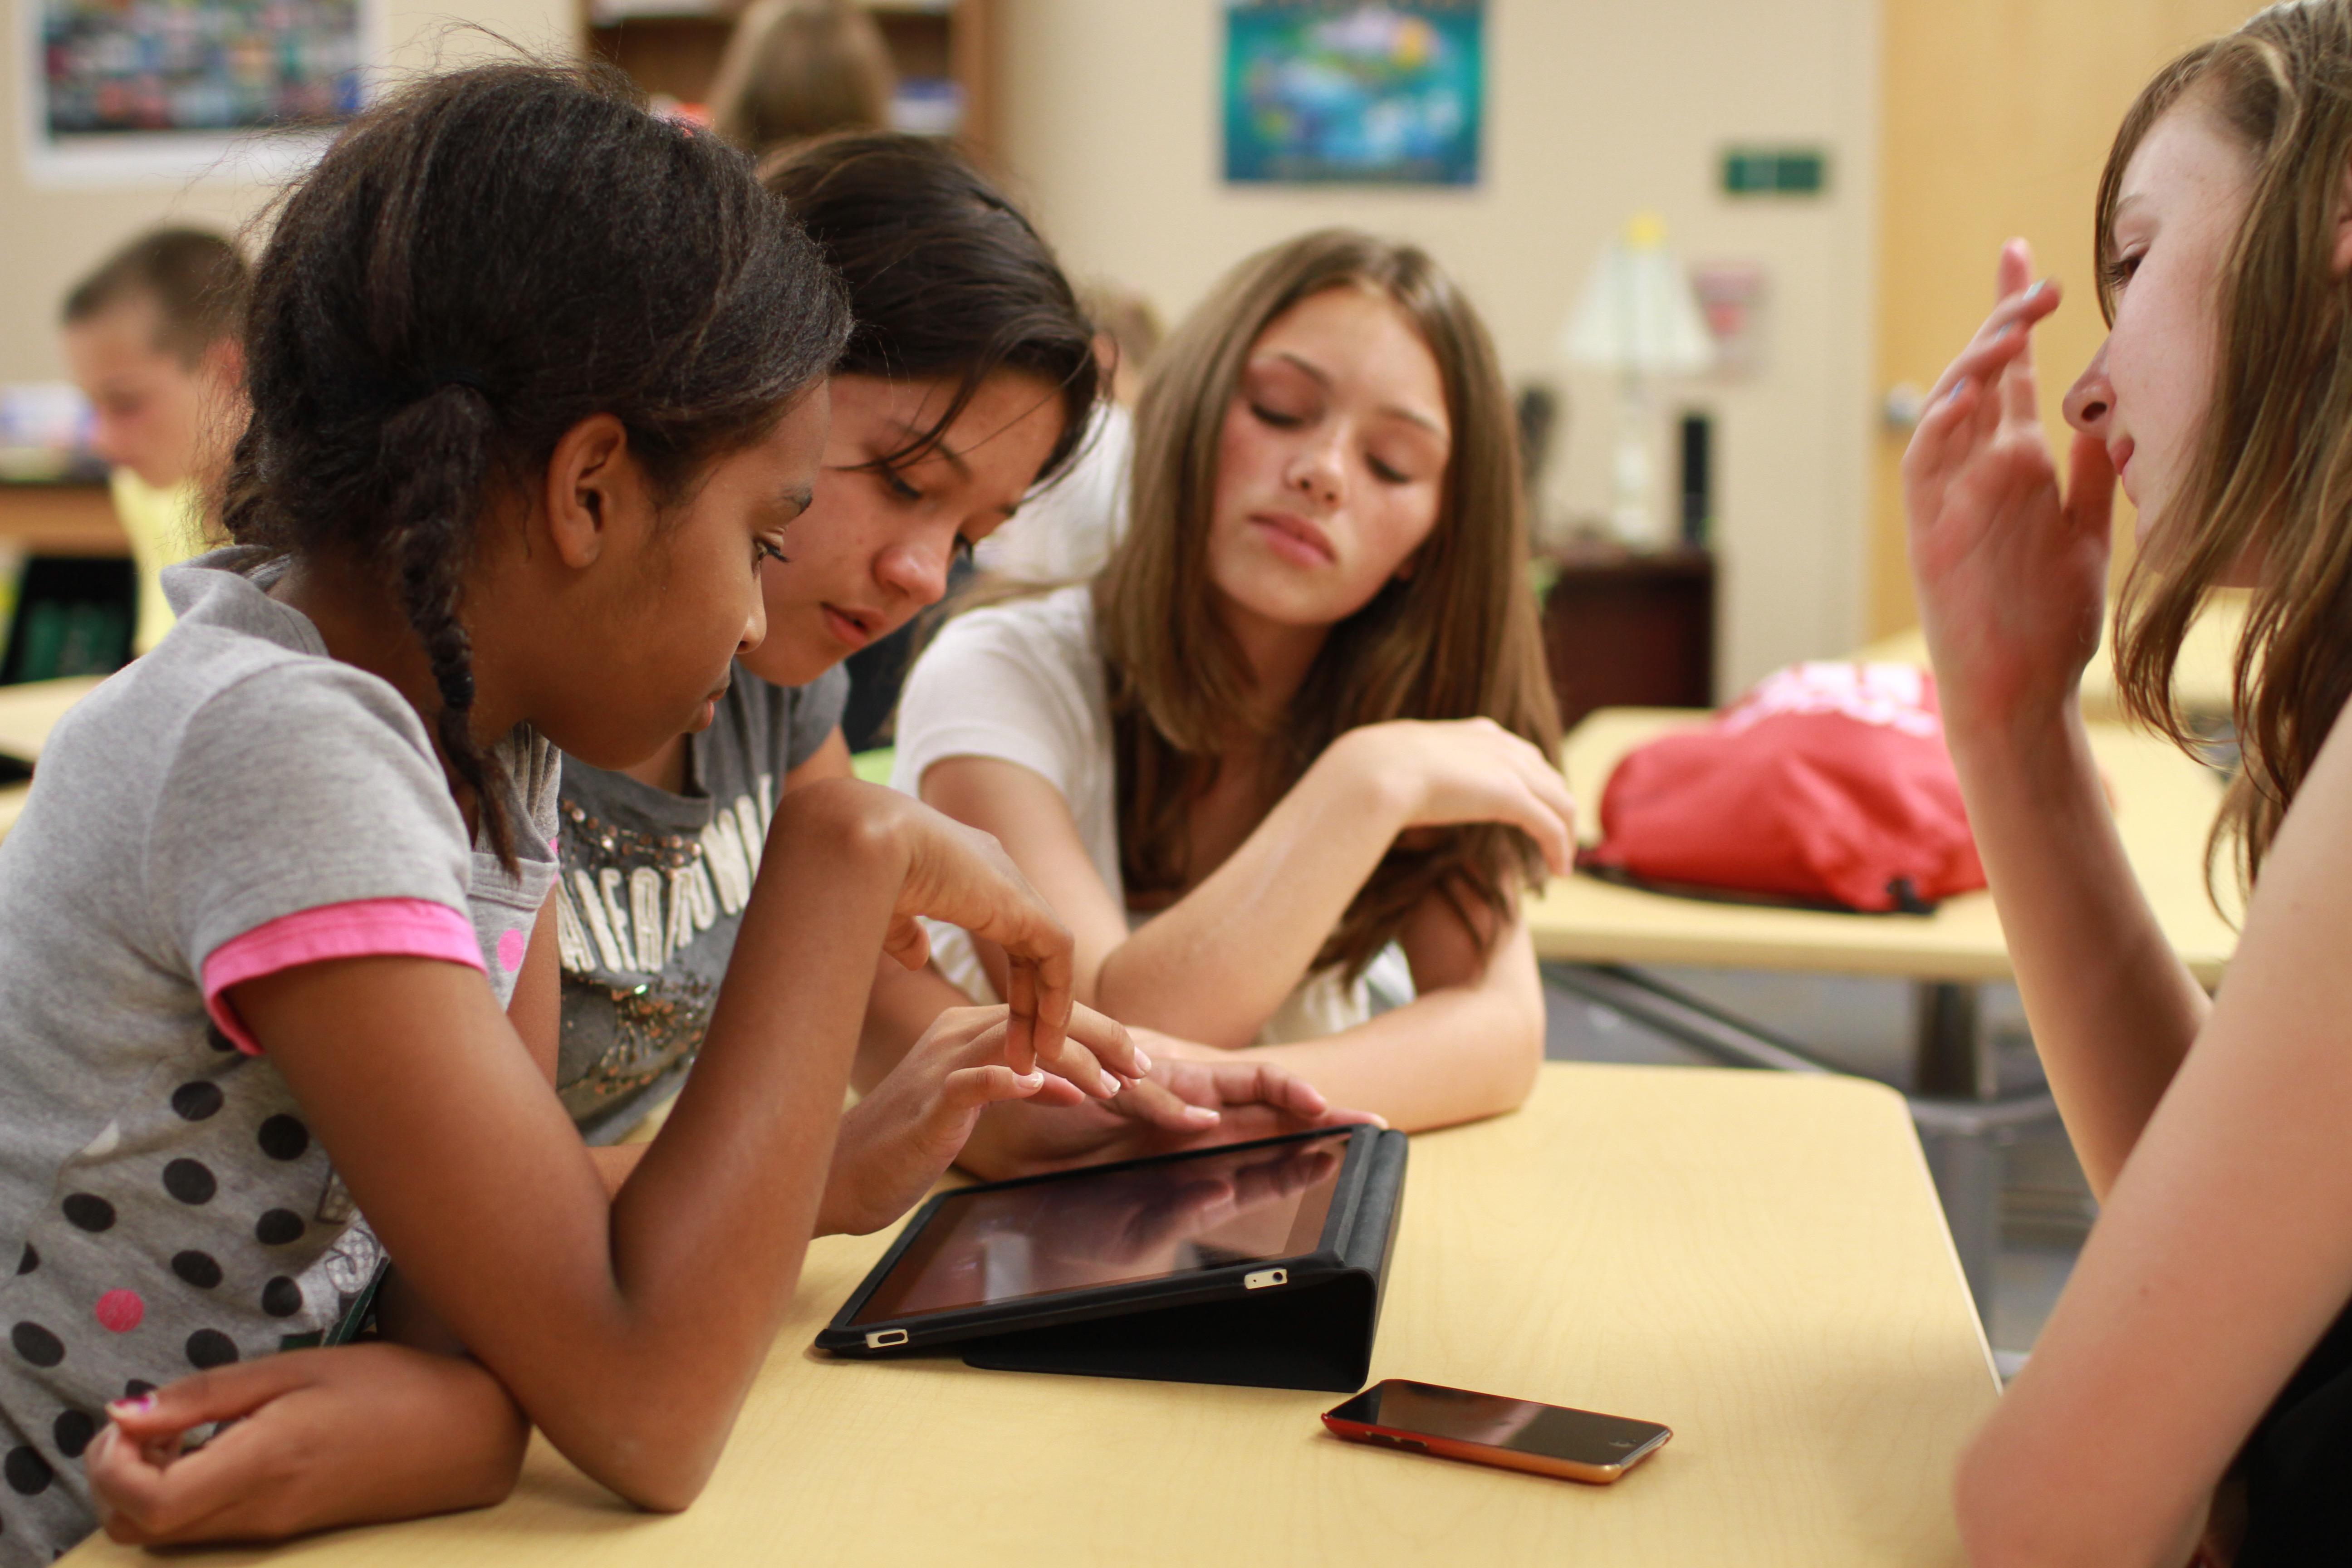 Girls learning using an iPad